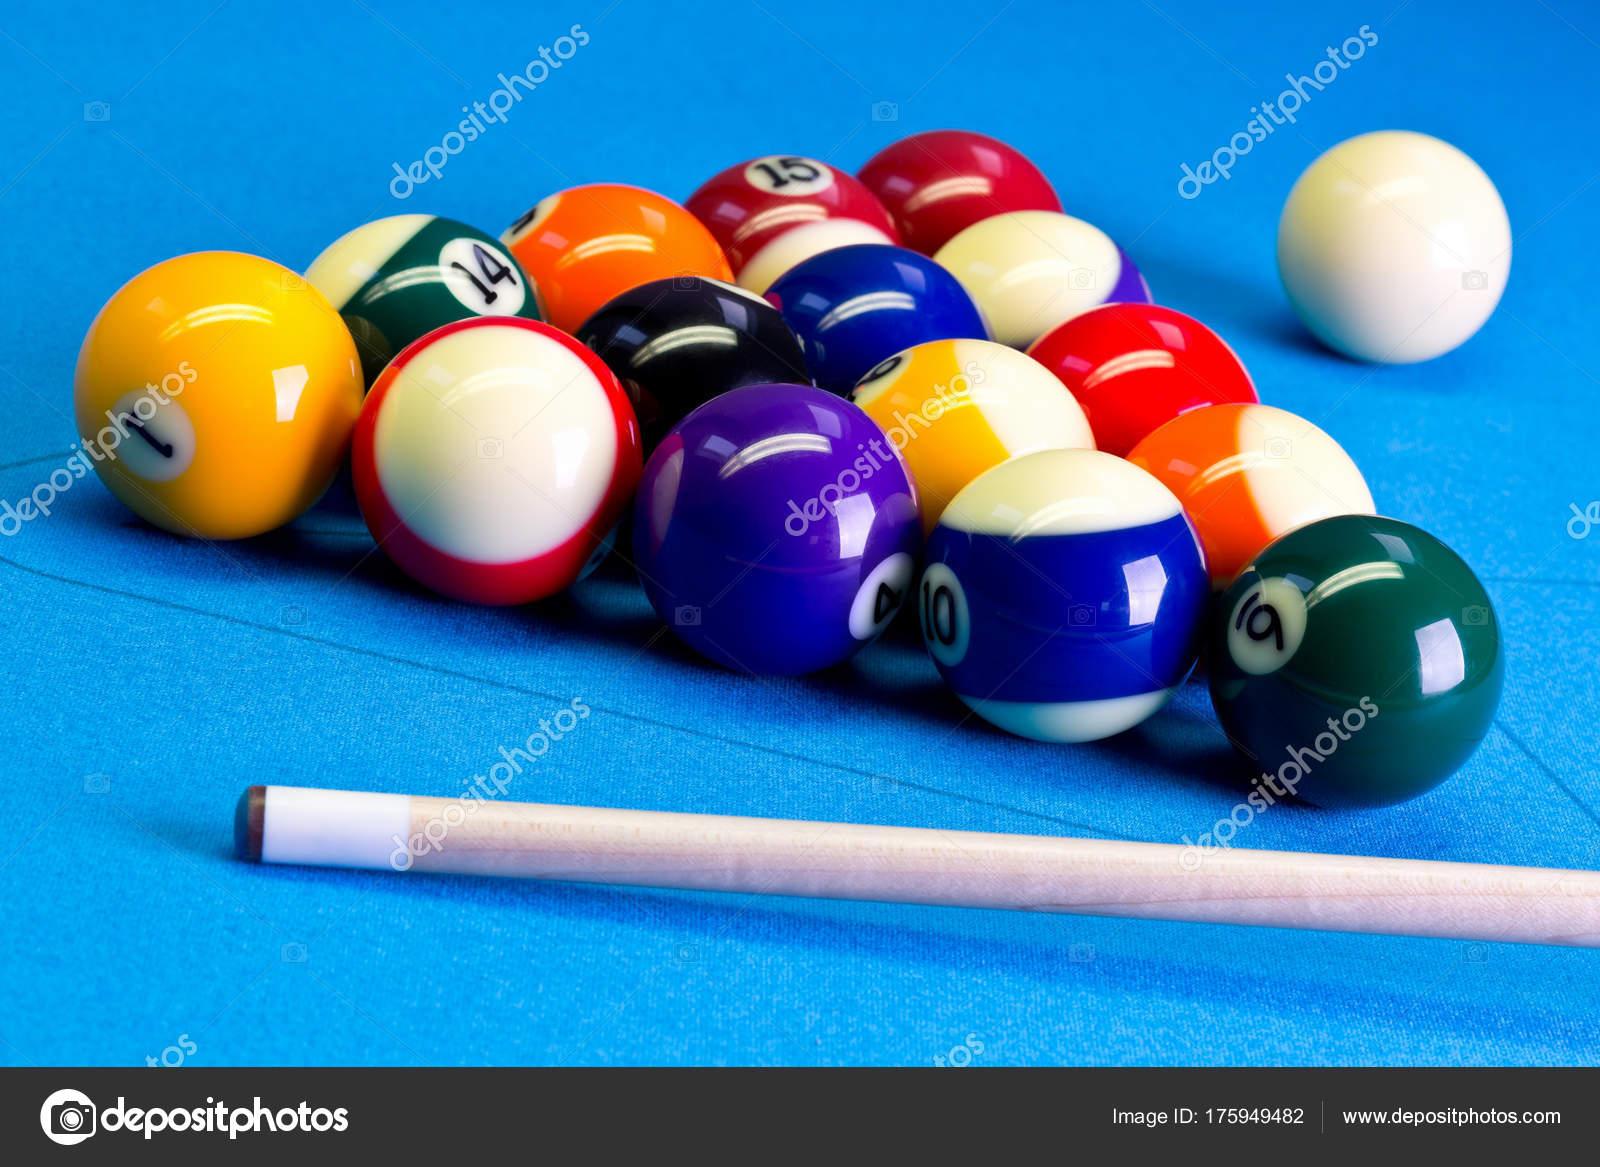 Pool Table Setup >> Billiard Pool Game Eight Ball Setup With Cue On Billiard Table